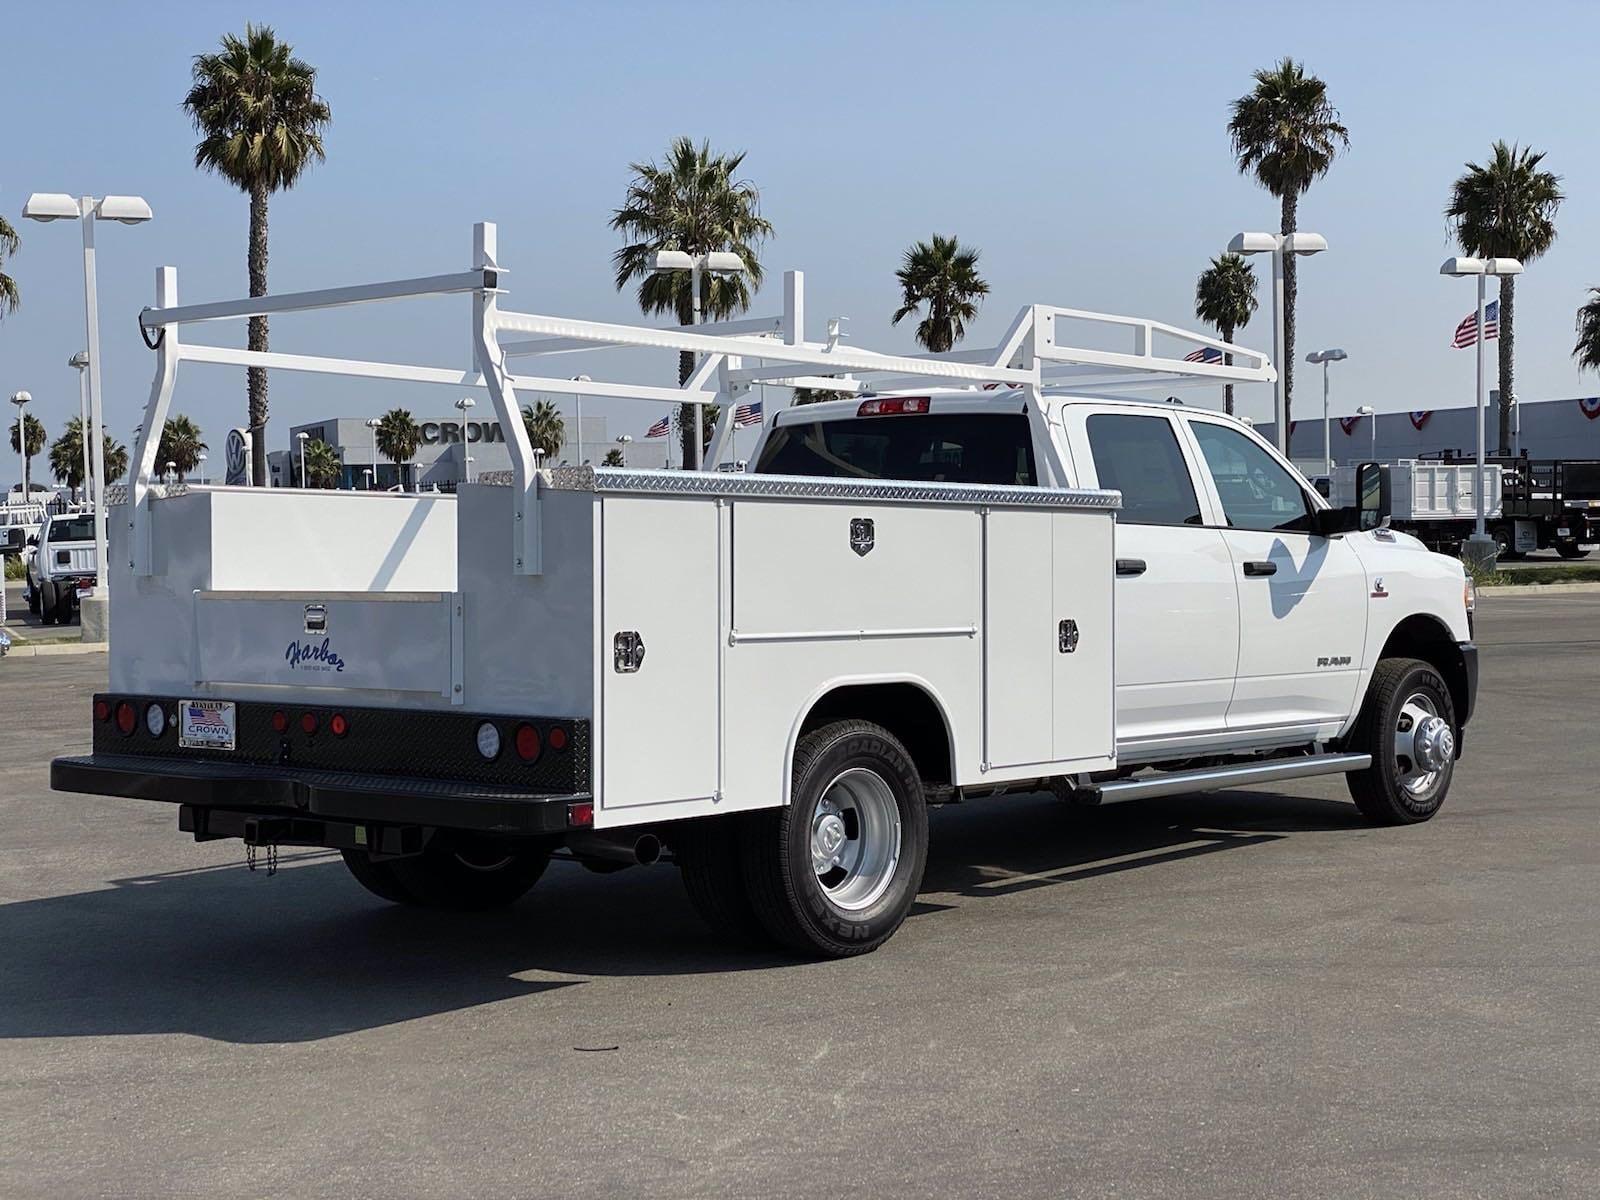 2020 Ram 3500 Crew Cab DRW 4x4, Harbor Service Body #H2362 - photo 1